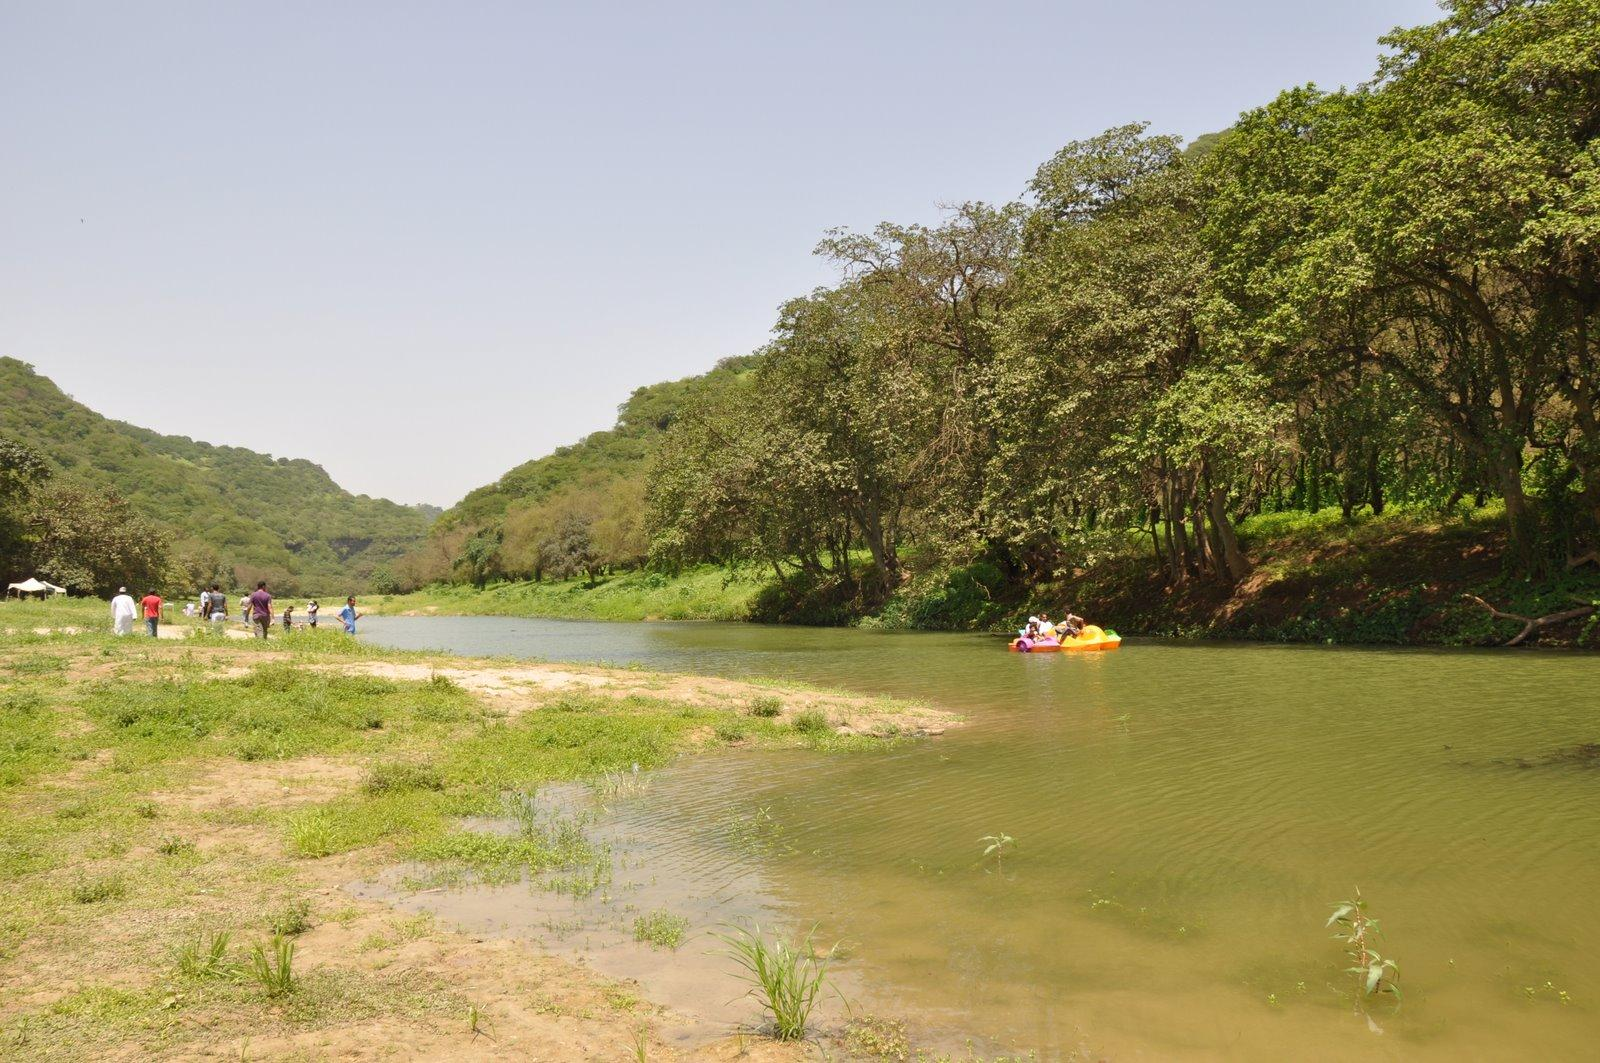 39 Wadi Derbat.JPG